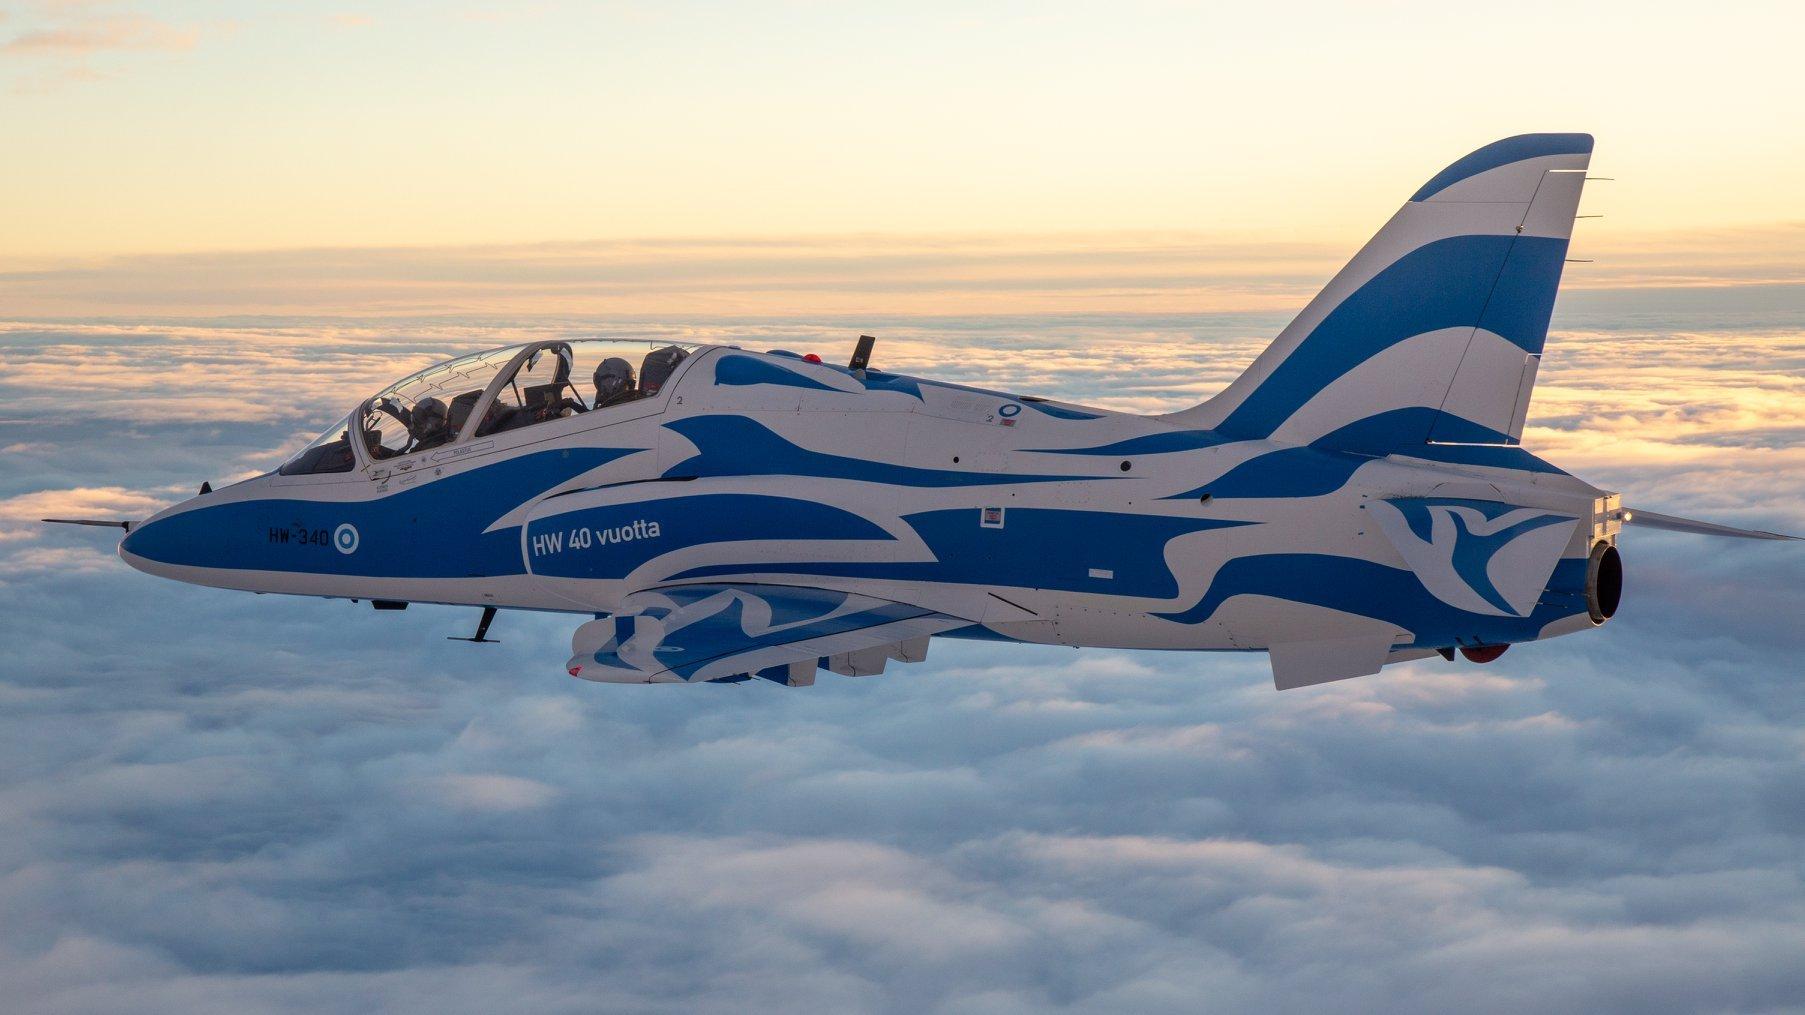 Finnish AF Hawk 40th Anniversary Scheme [Finnish Air Force]